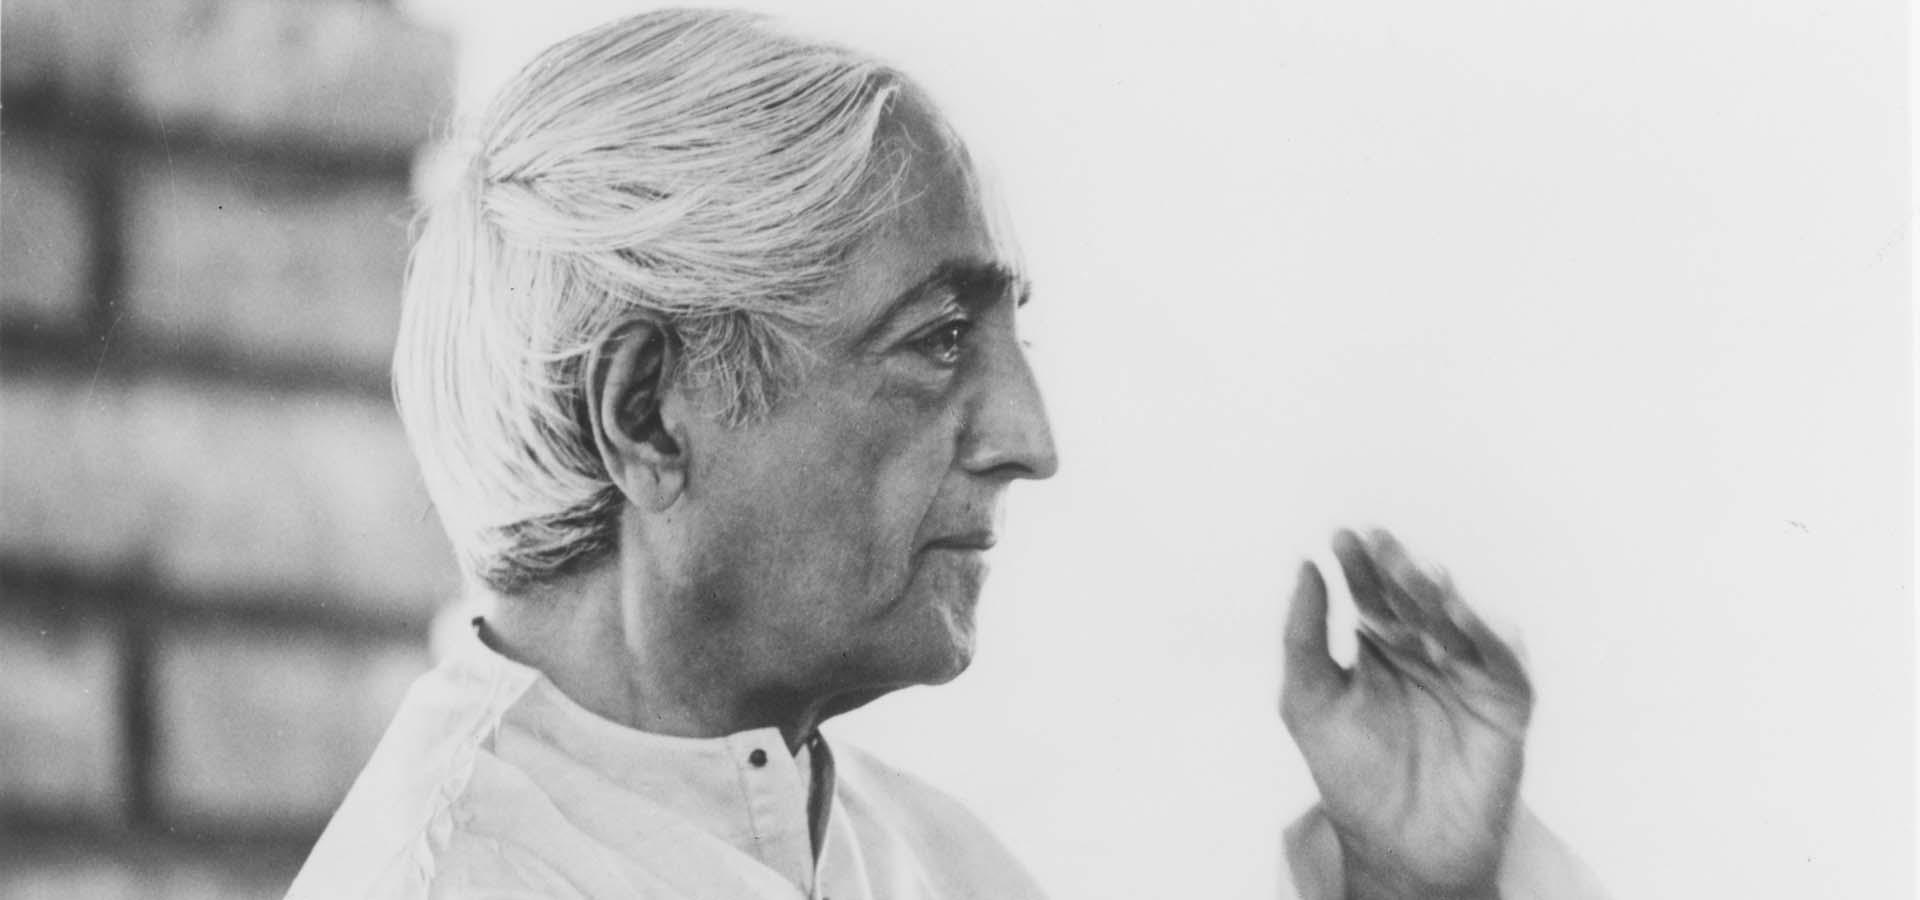 Jiddu Krishnamurti - Ο Άνθρωπος θα'πρεπε να έχει μια βαθιά, μόνιμη Σχέση με τη Φύση… - Εις Εαυτόν